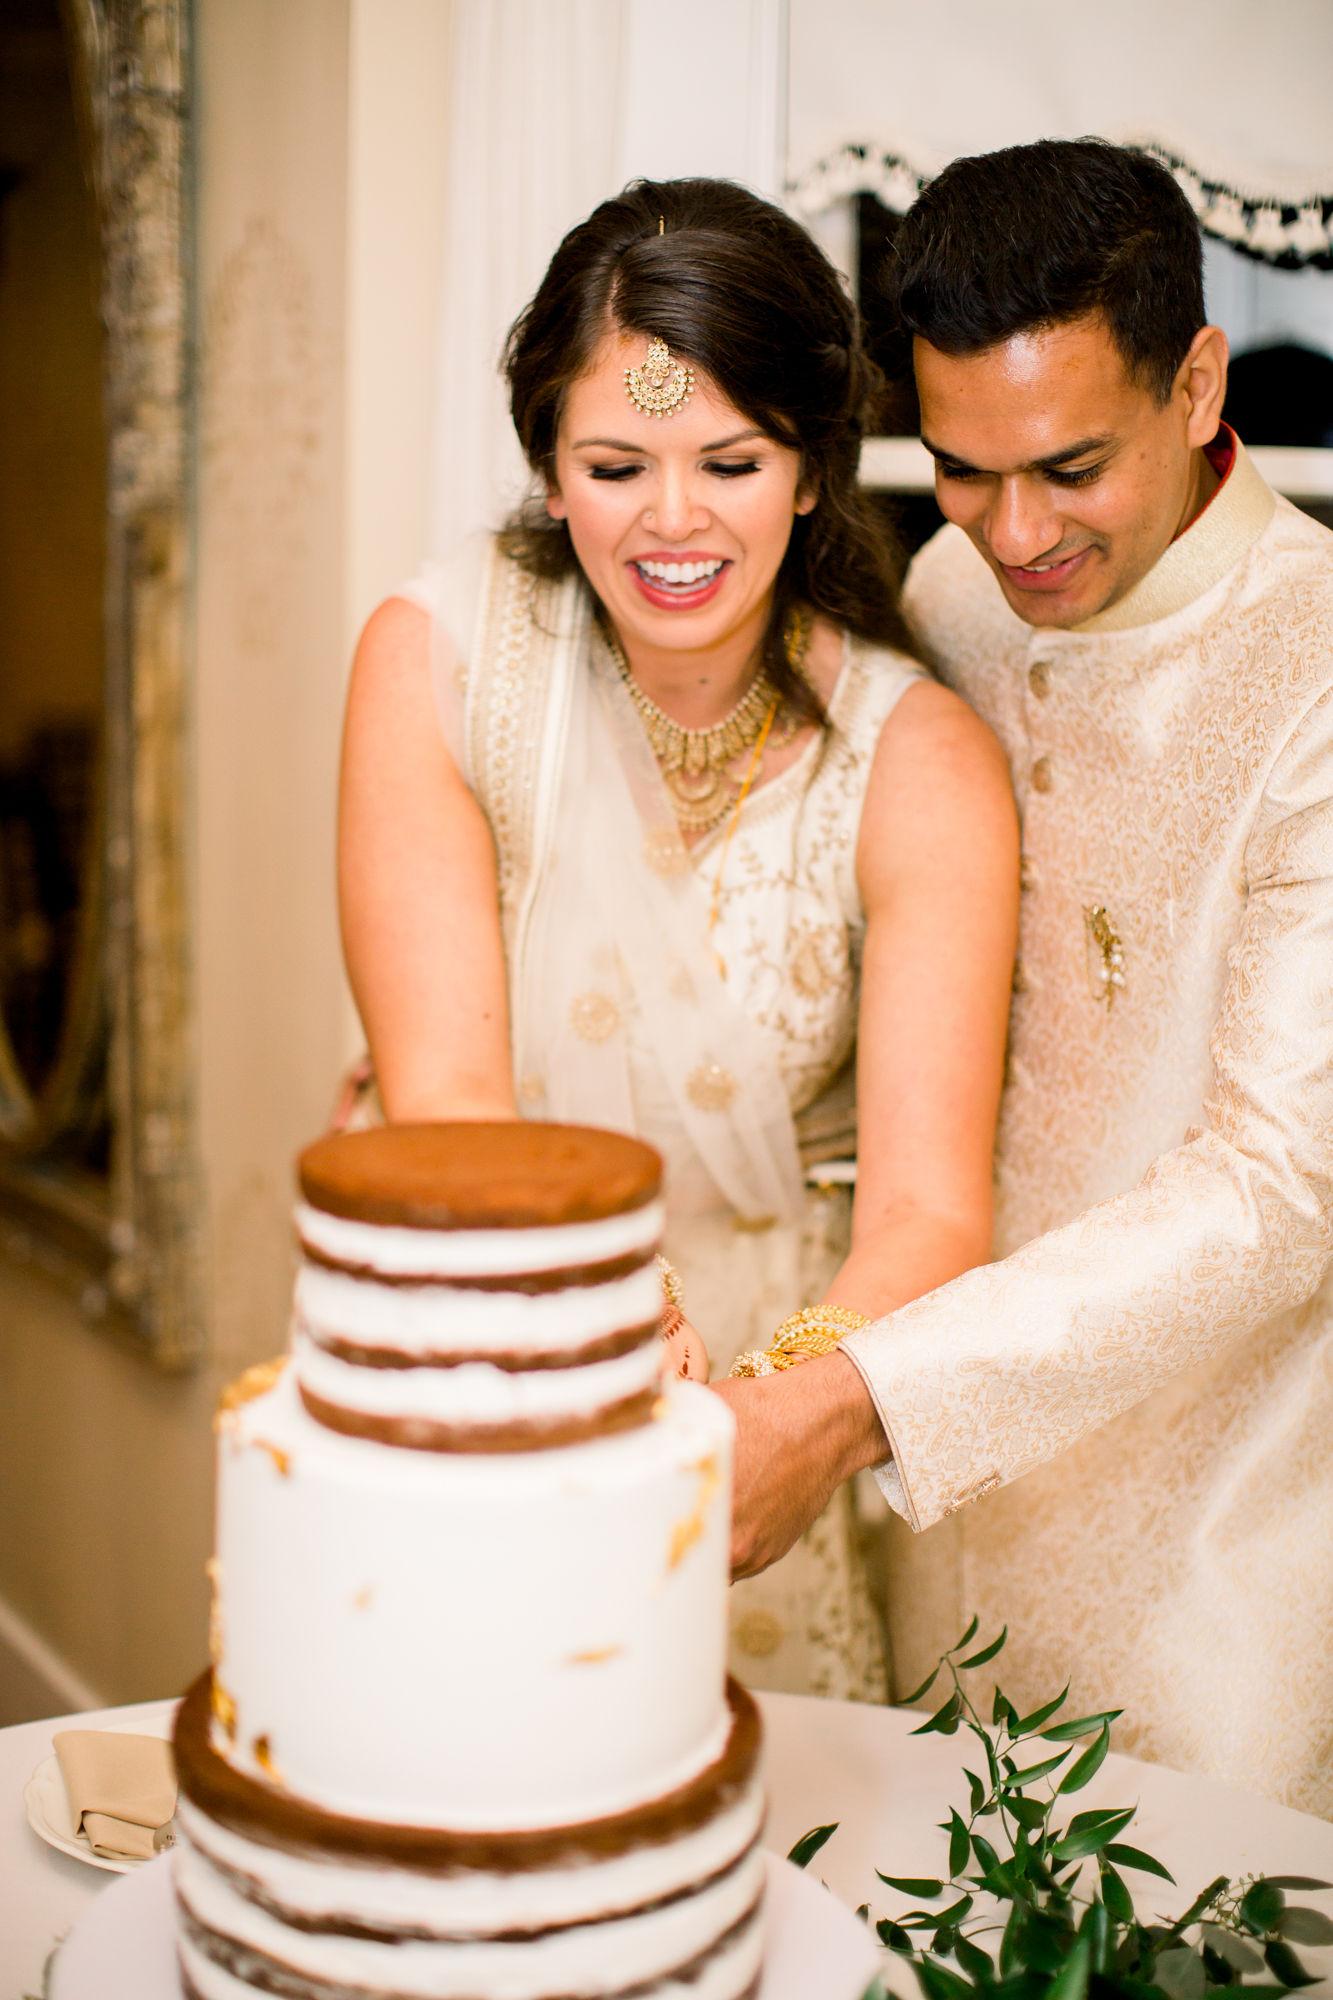 Couple Cutting Cake at Monterey Wedding Venue